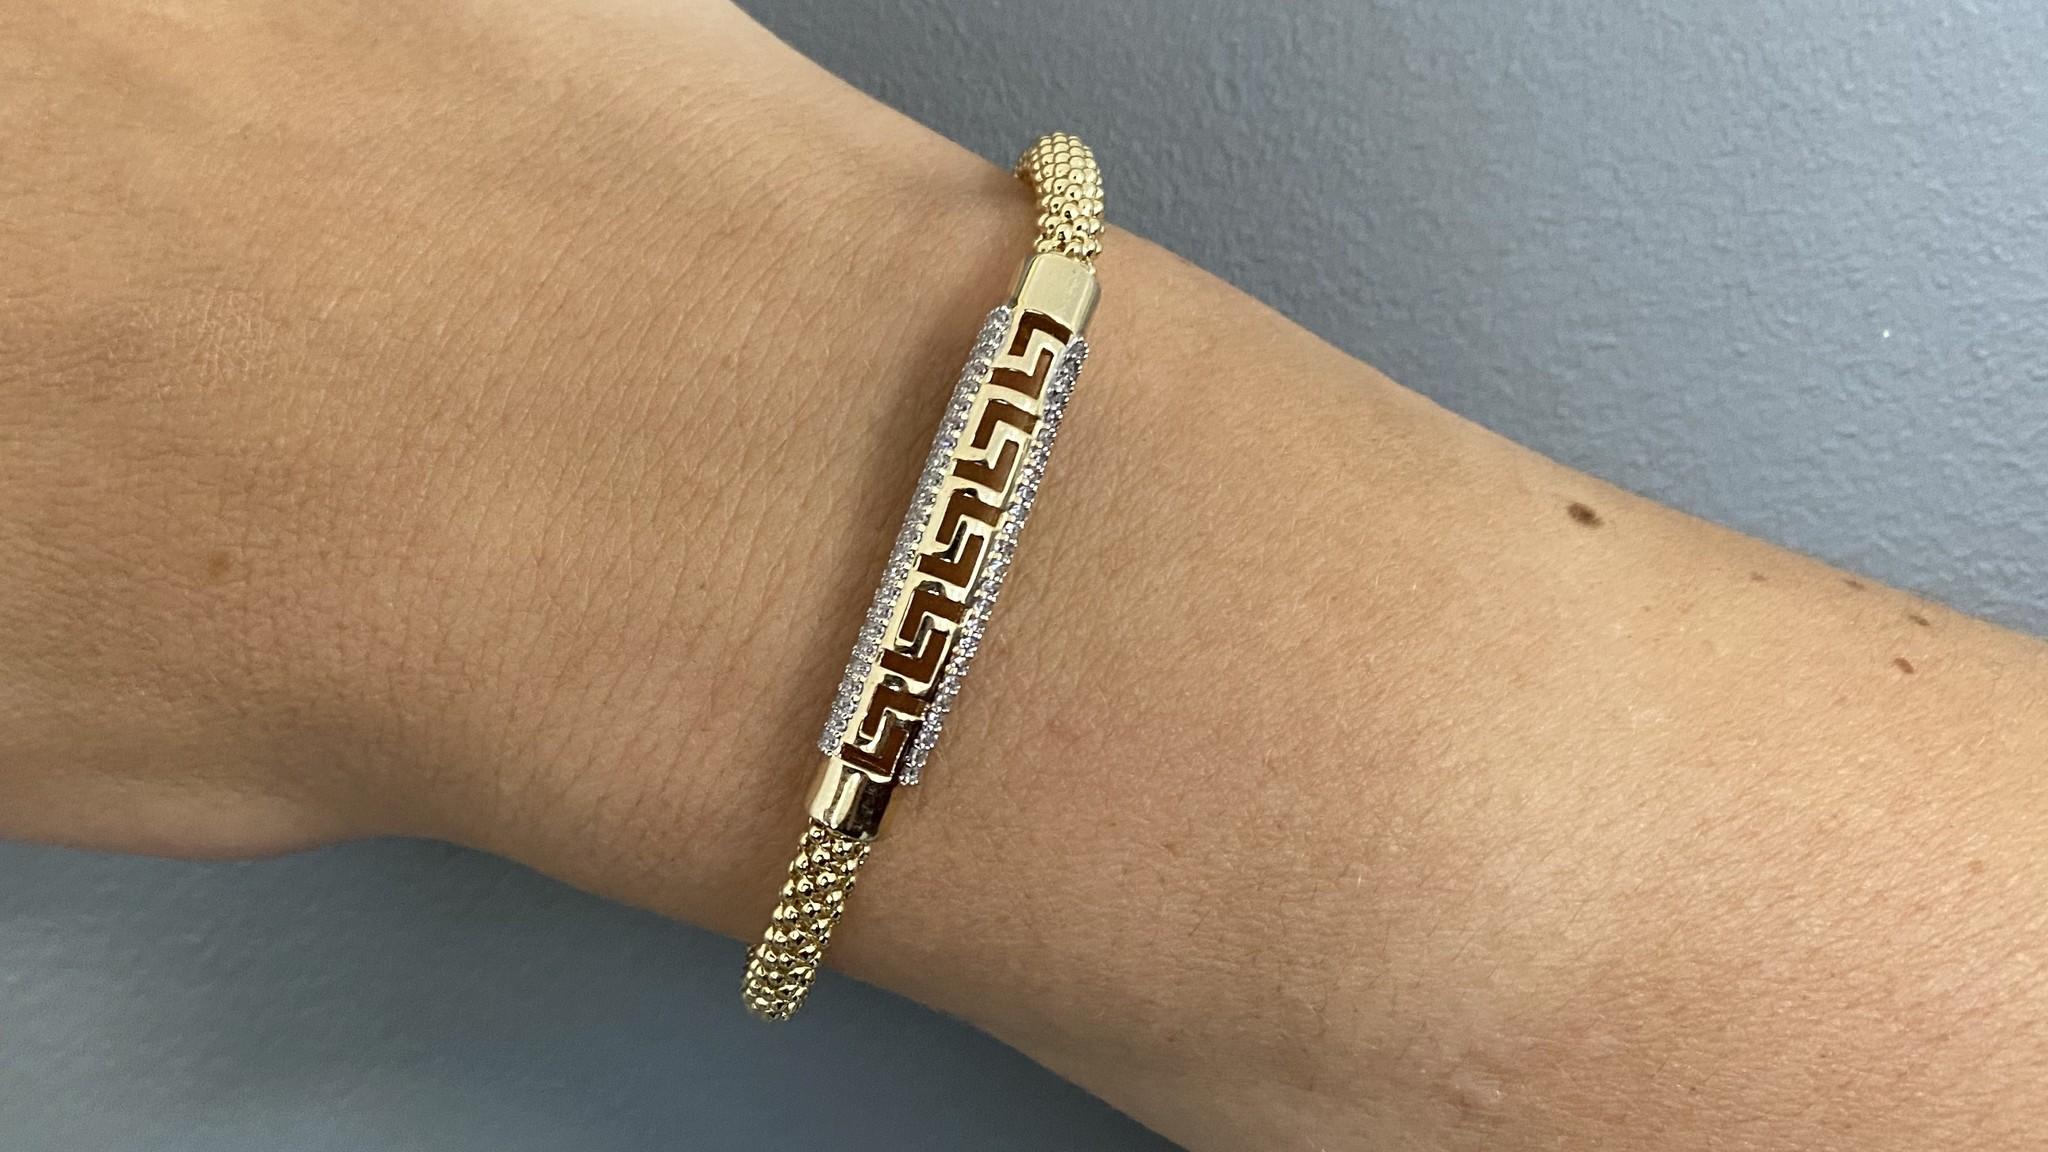 Armband halve slavenband versace met zirkonia's en flexibele boto ketti-2